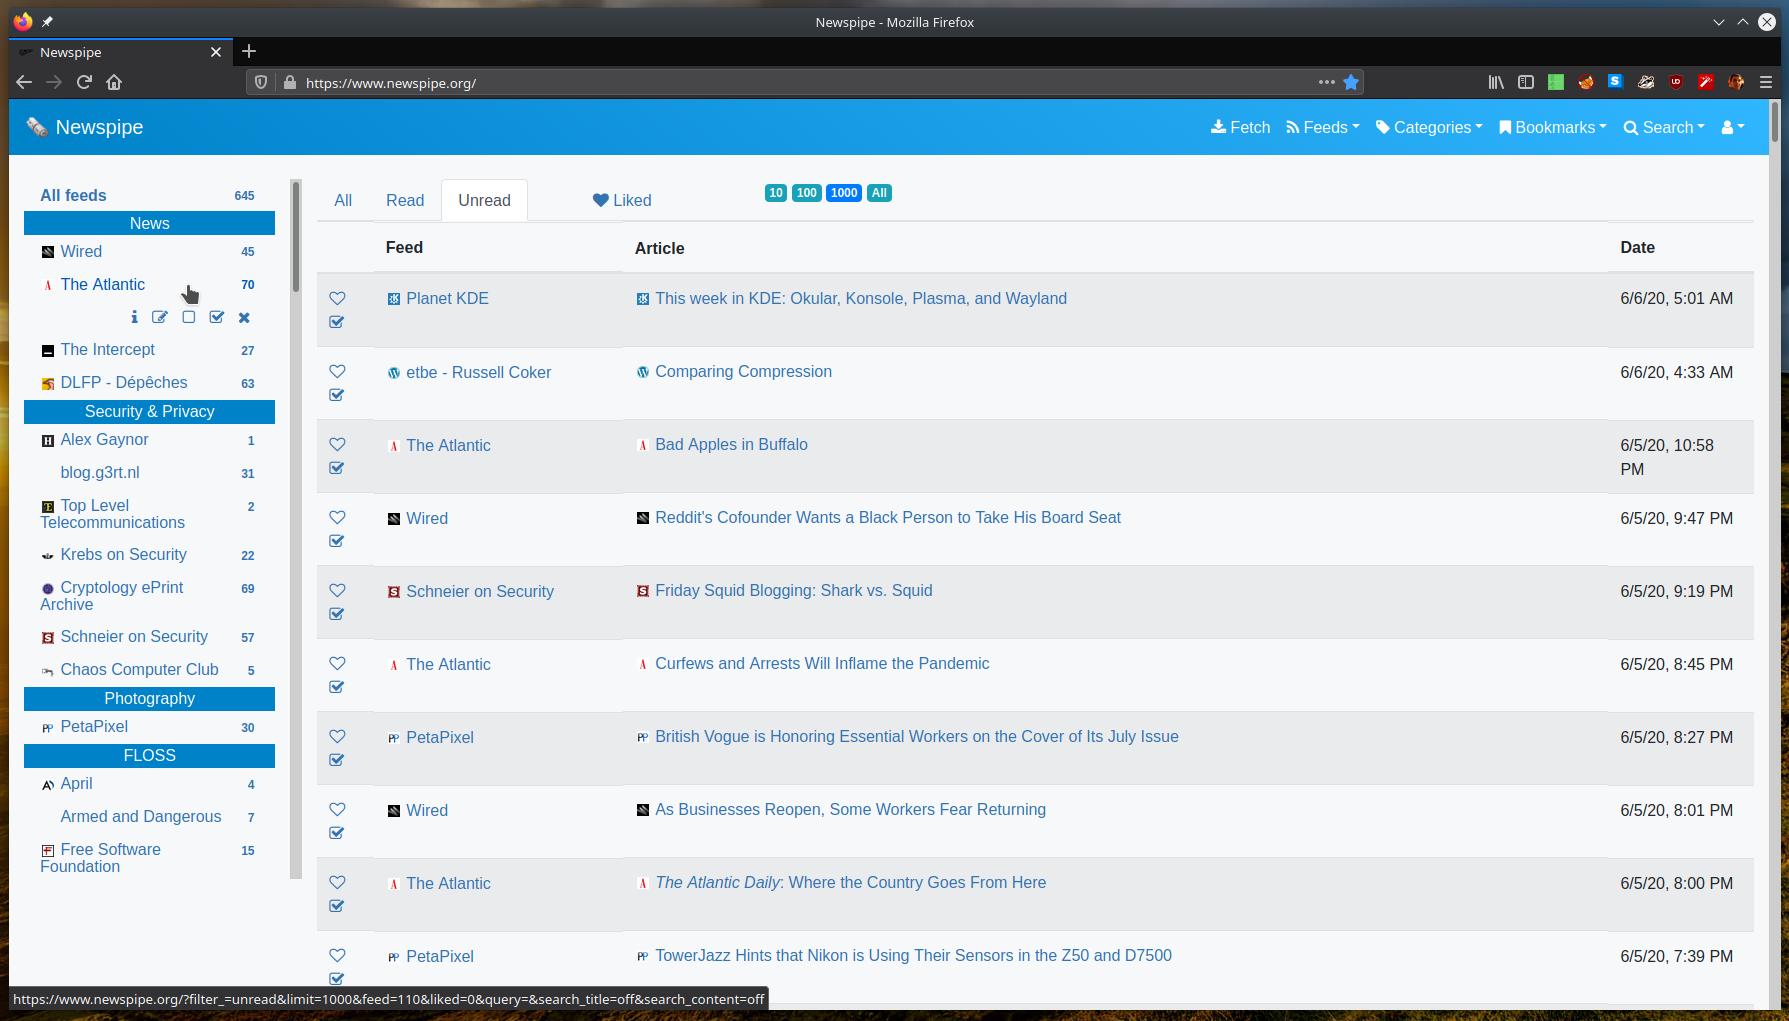 Newspipe Home page